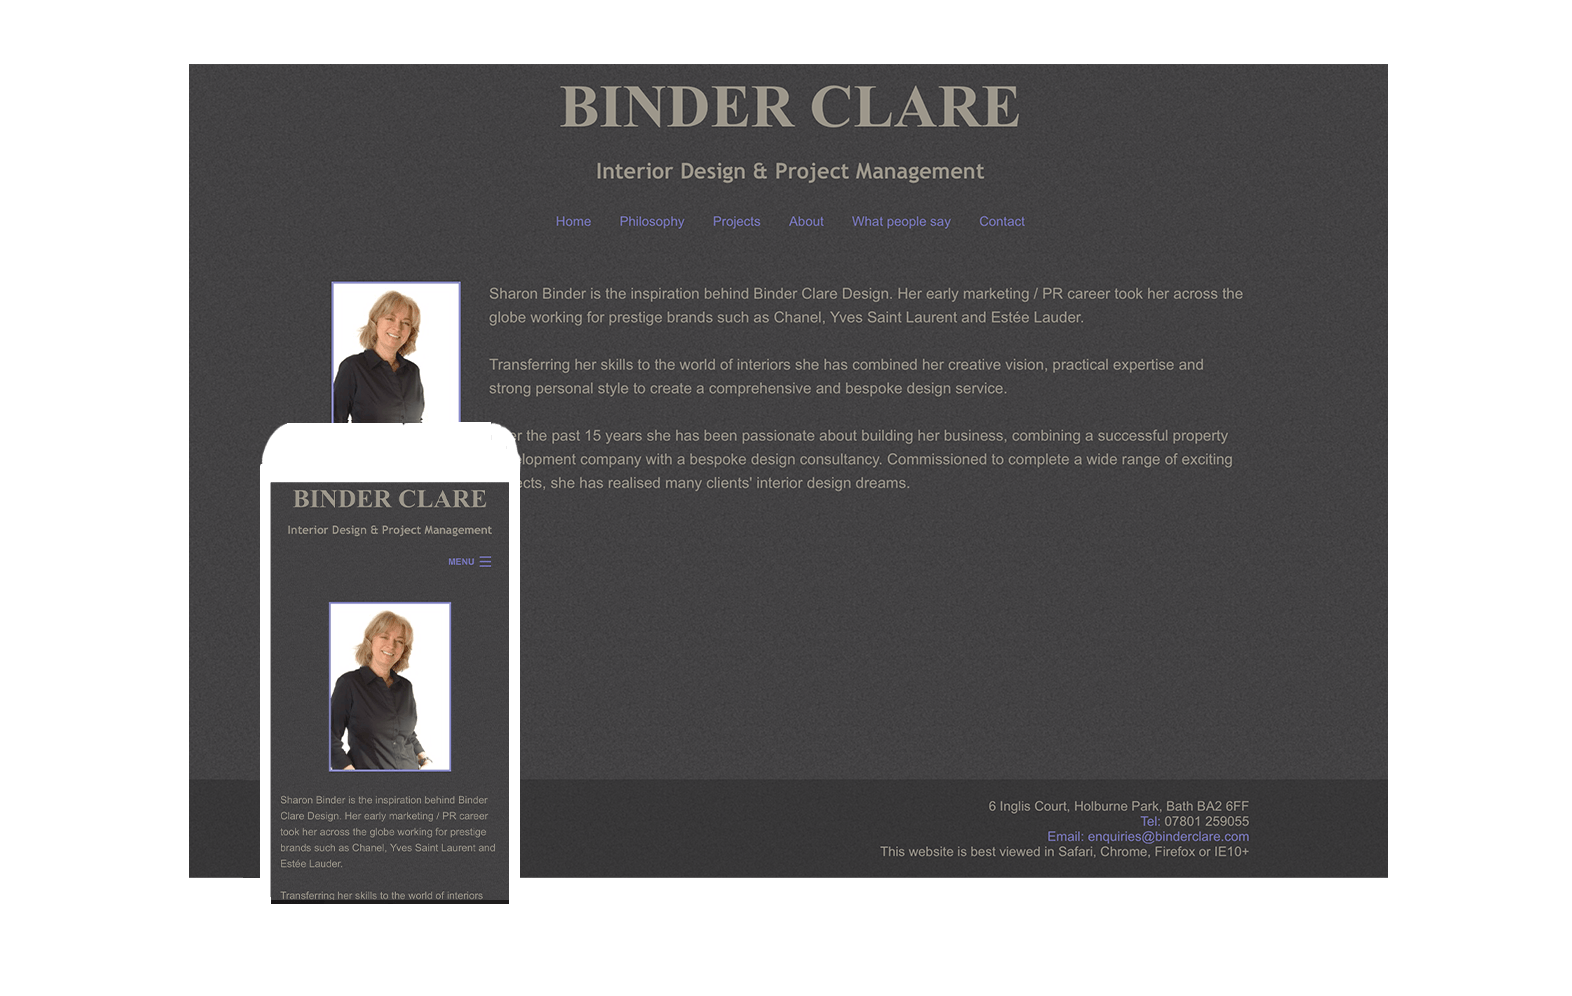 Binder Clare website image